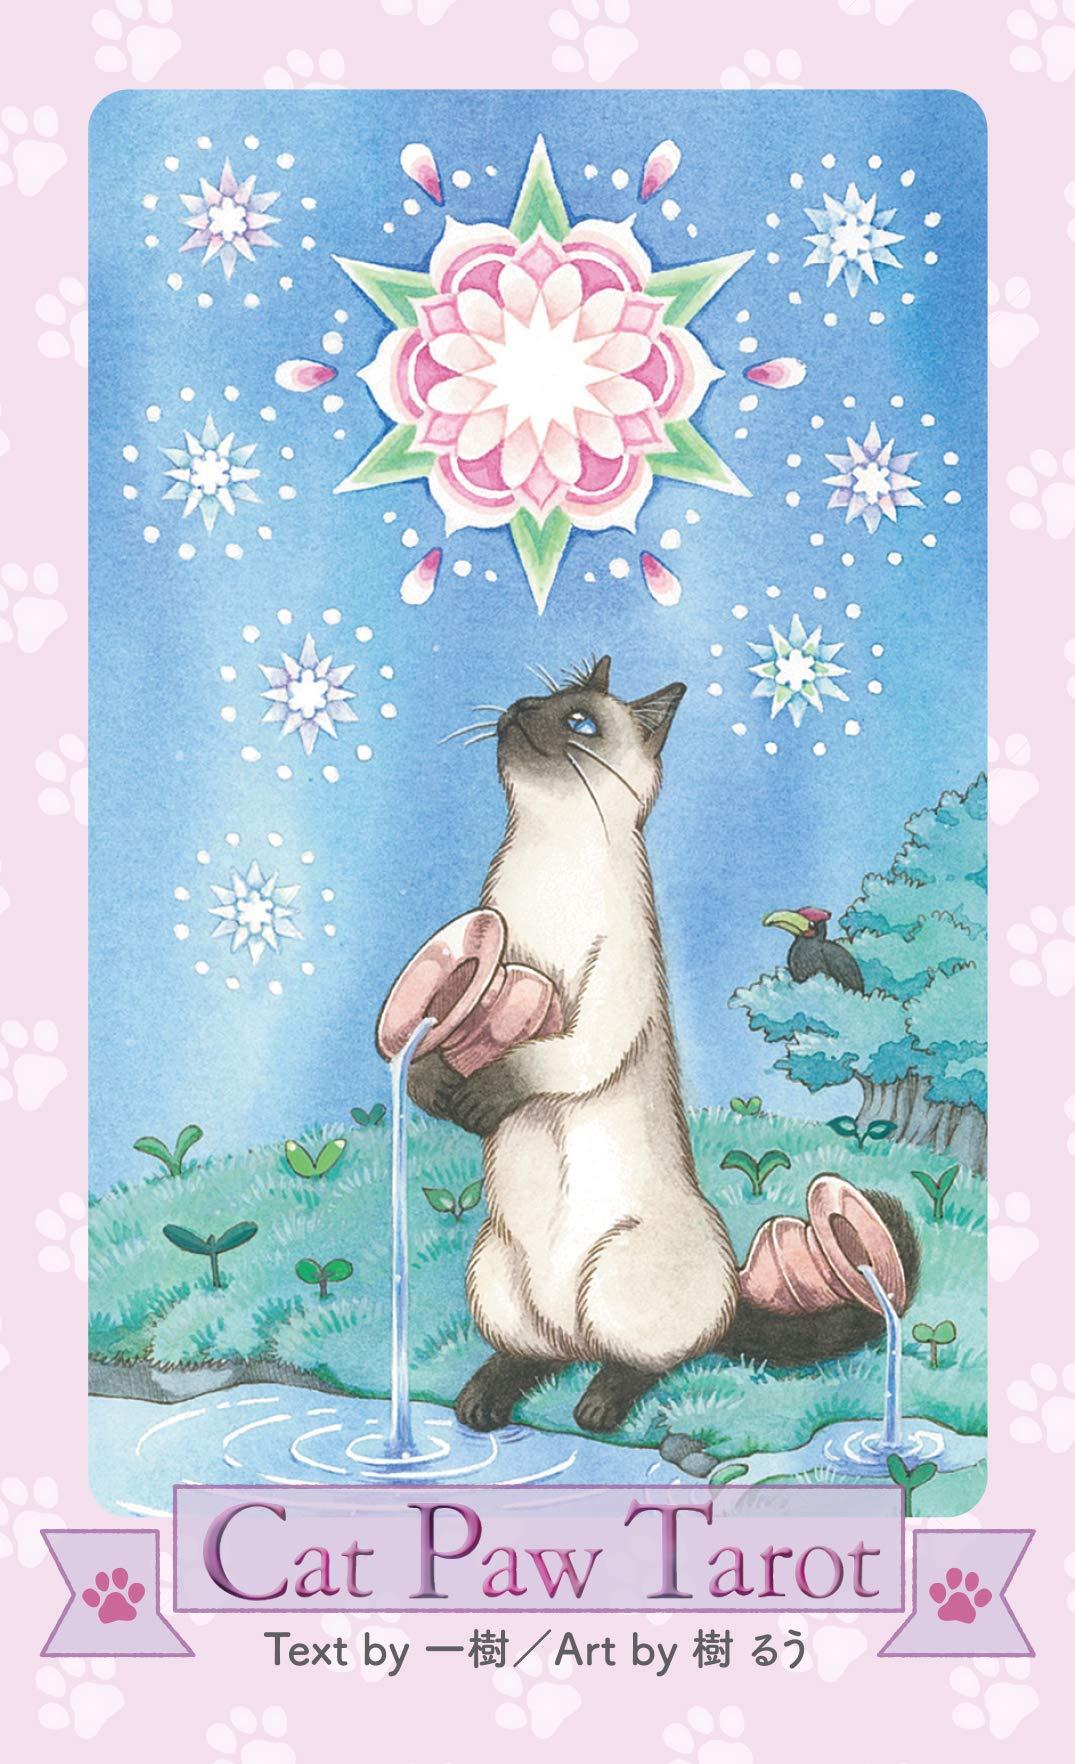 Cat Paw Tarot